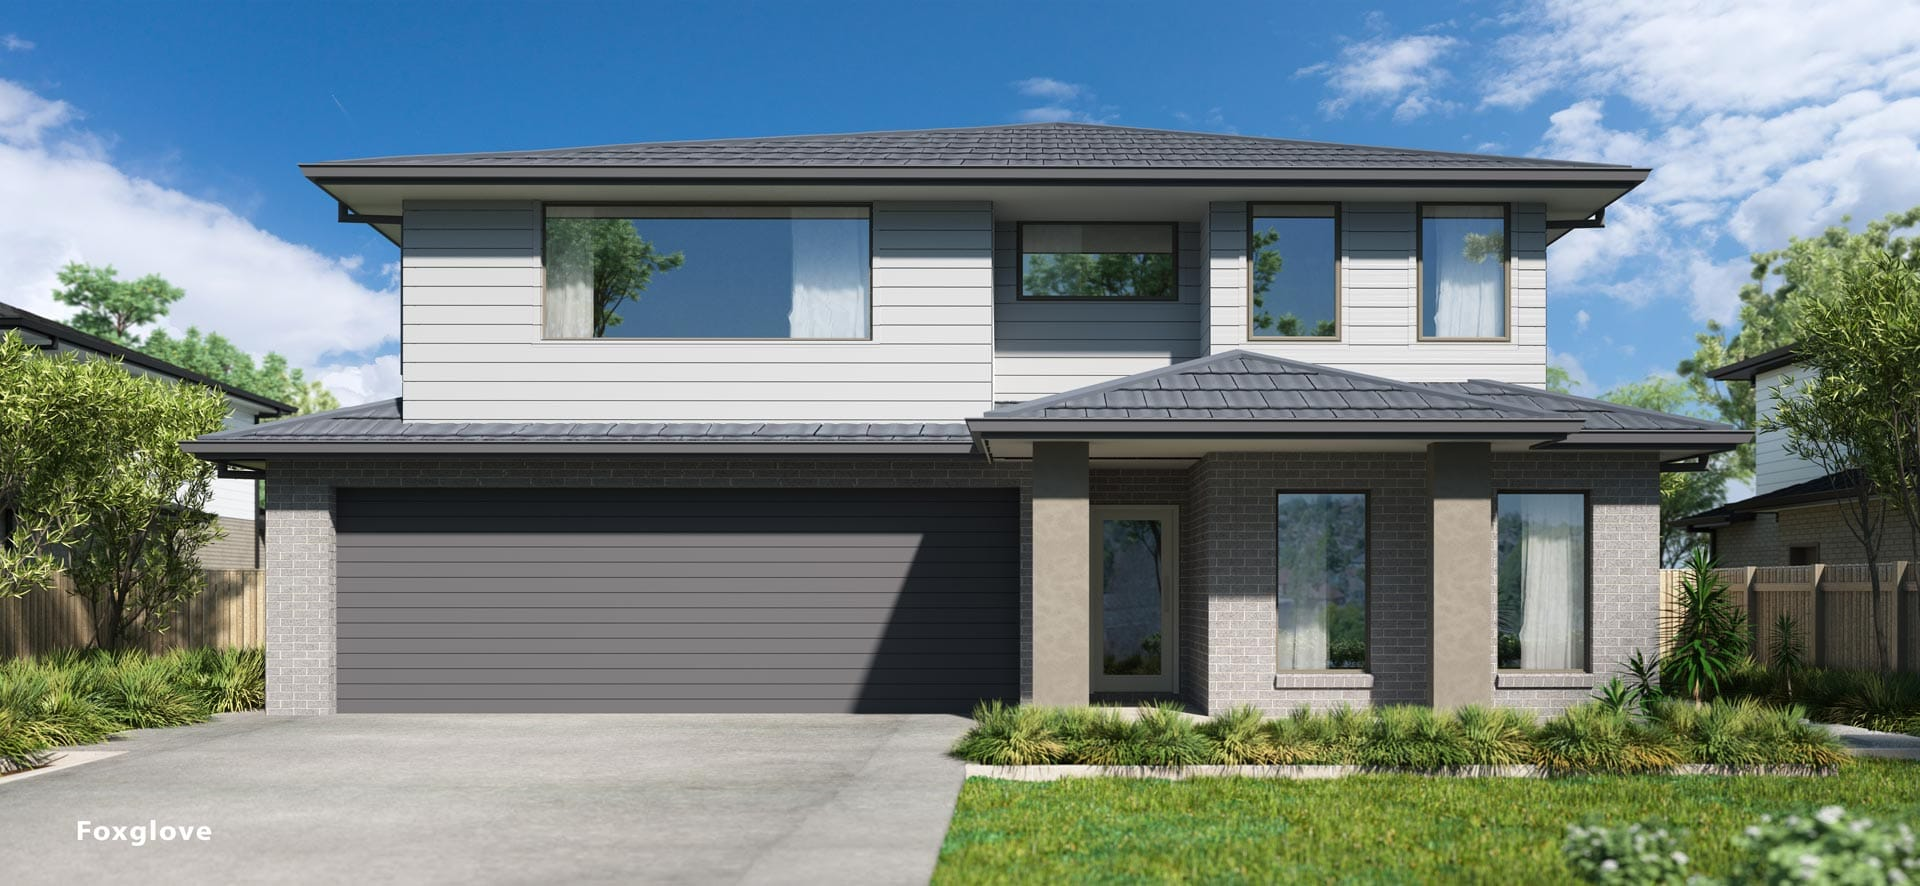 Foxglove Double House Design